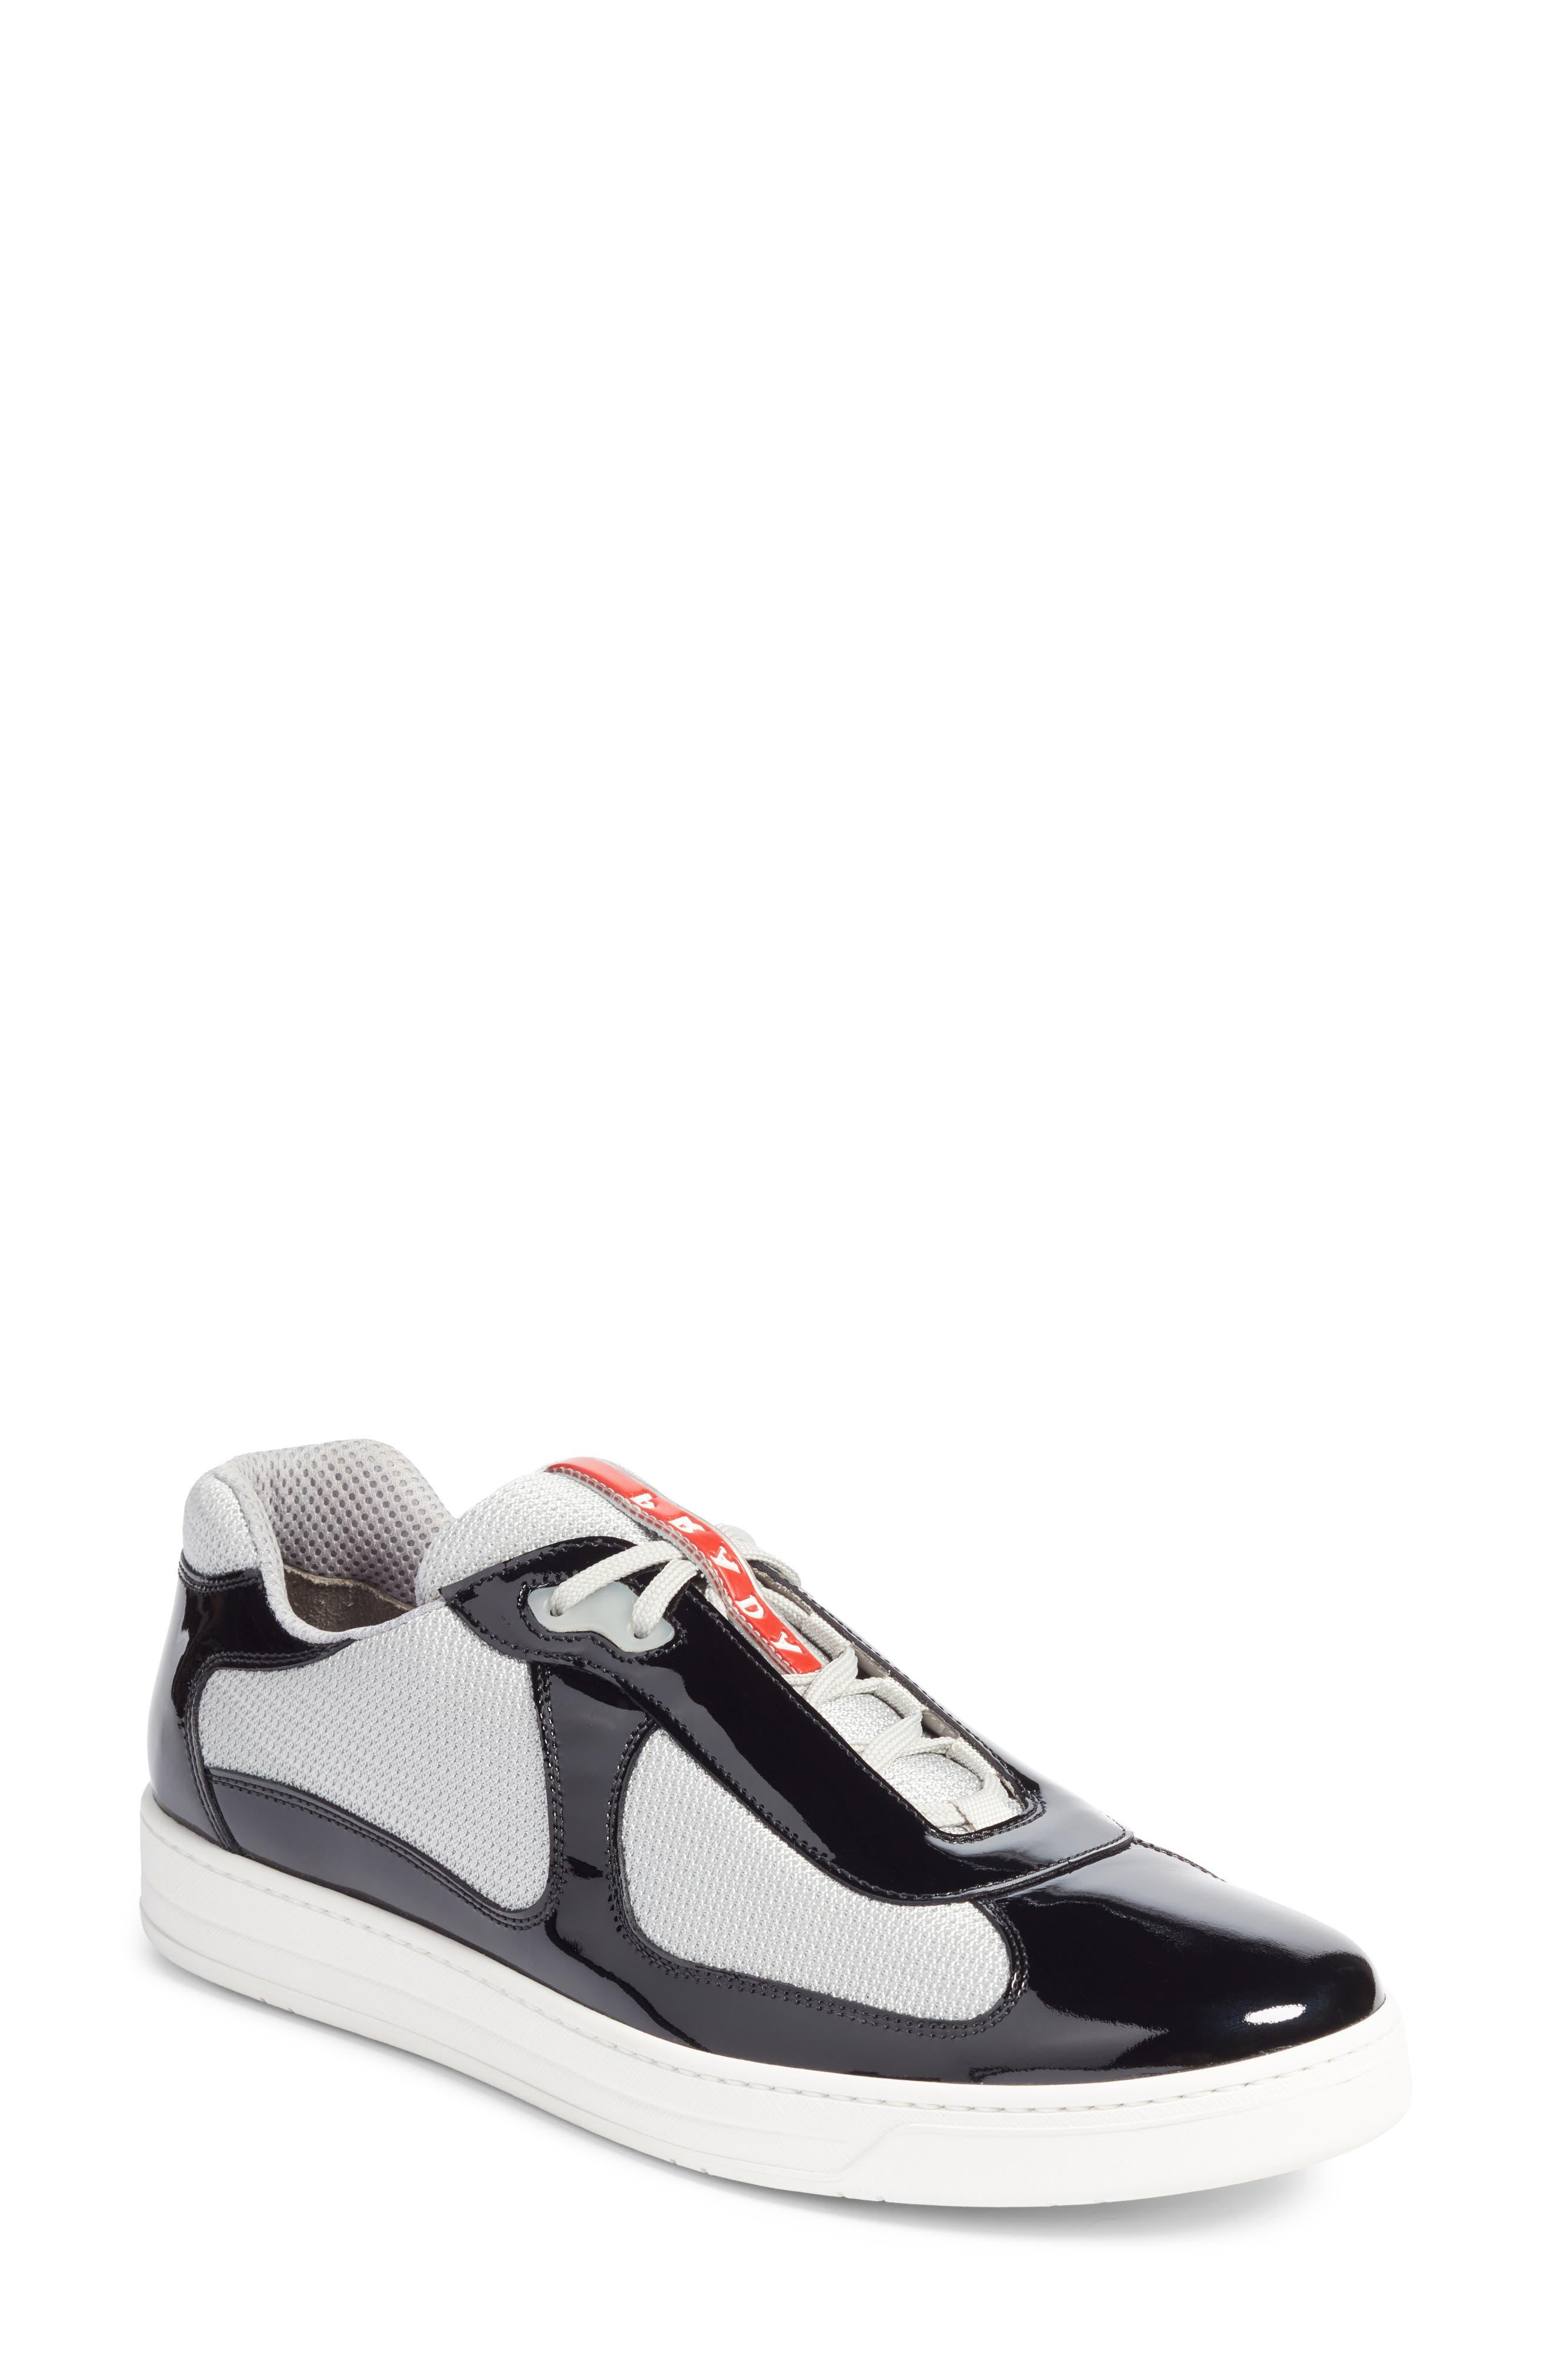 Linea Rossa New America's Cup Sneaker,                         Main,                         color, 009